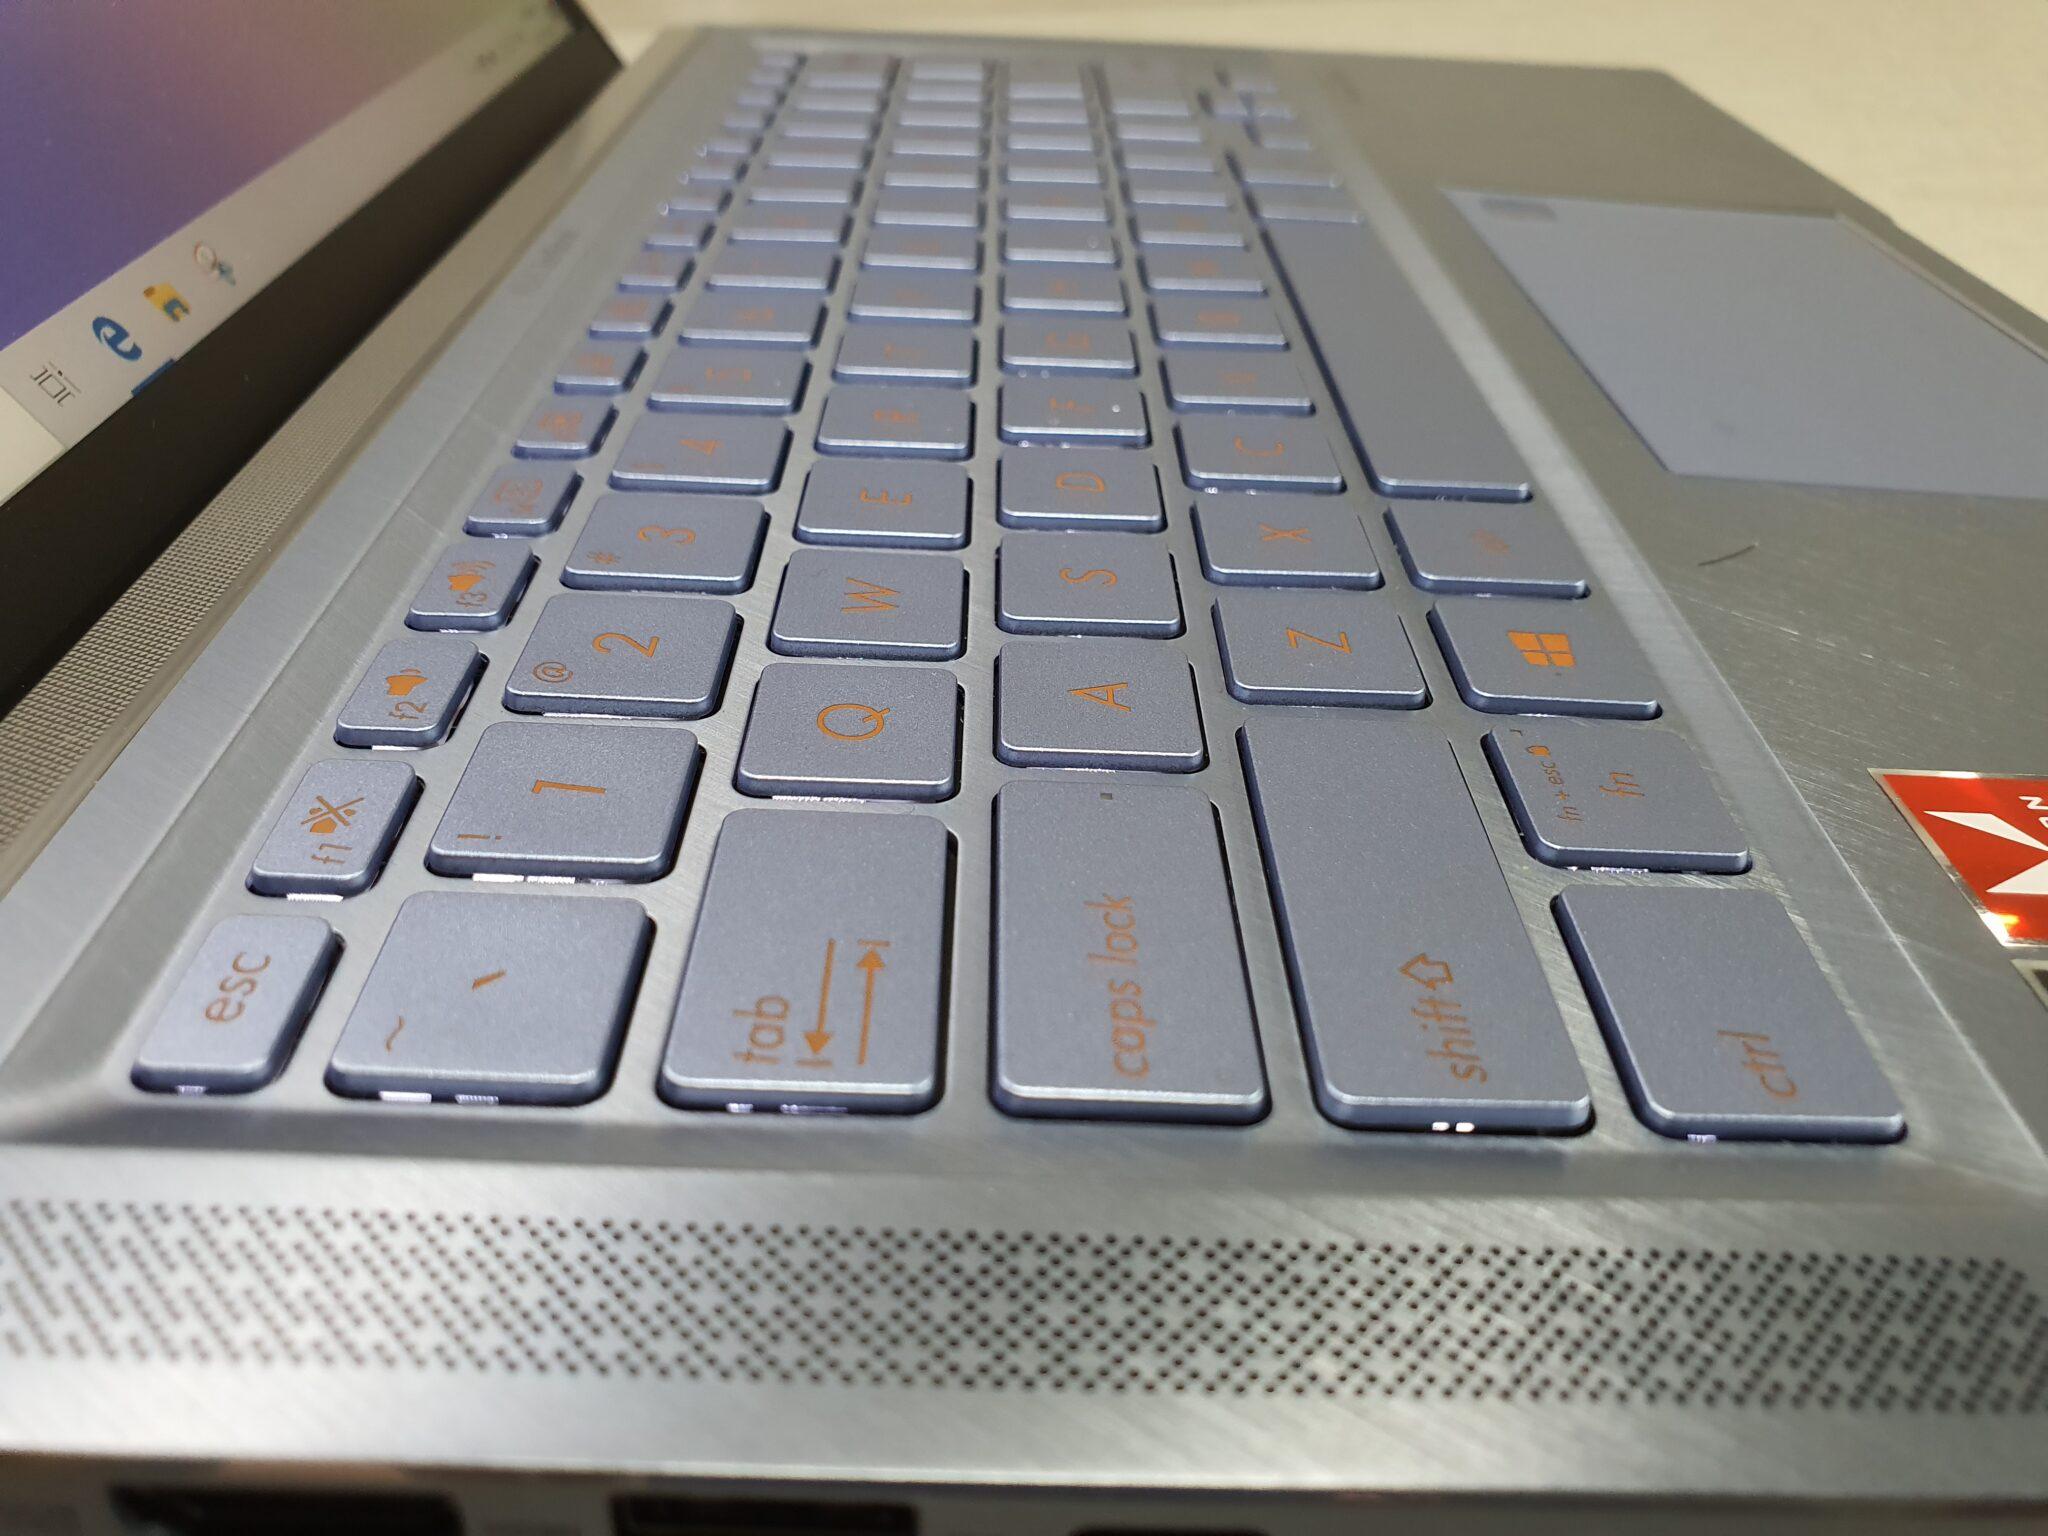 Asus ZenBook 14 UM431 speakers